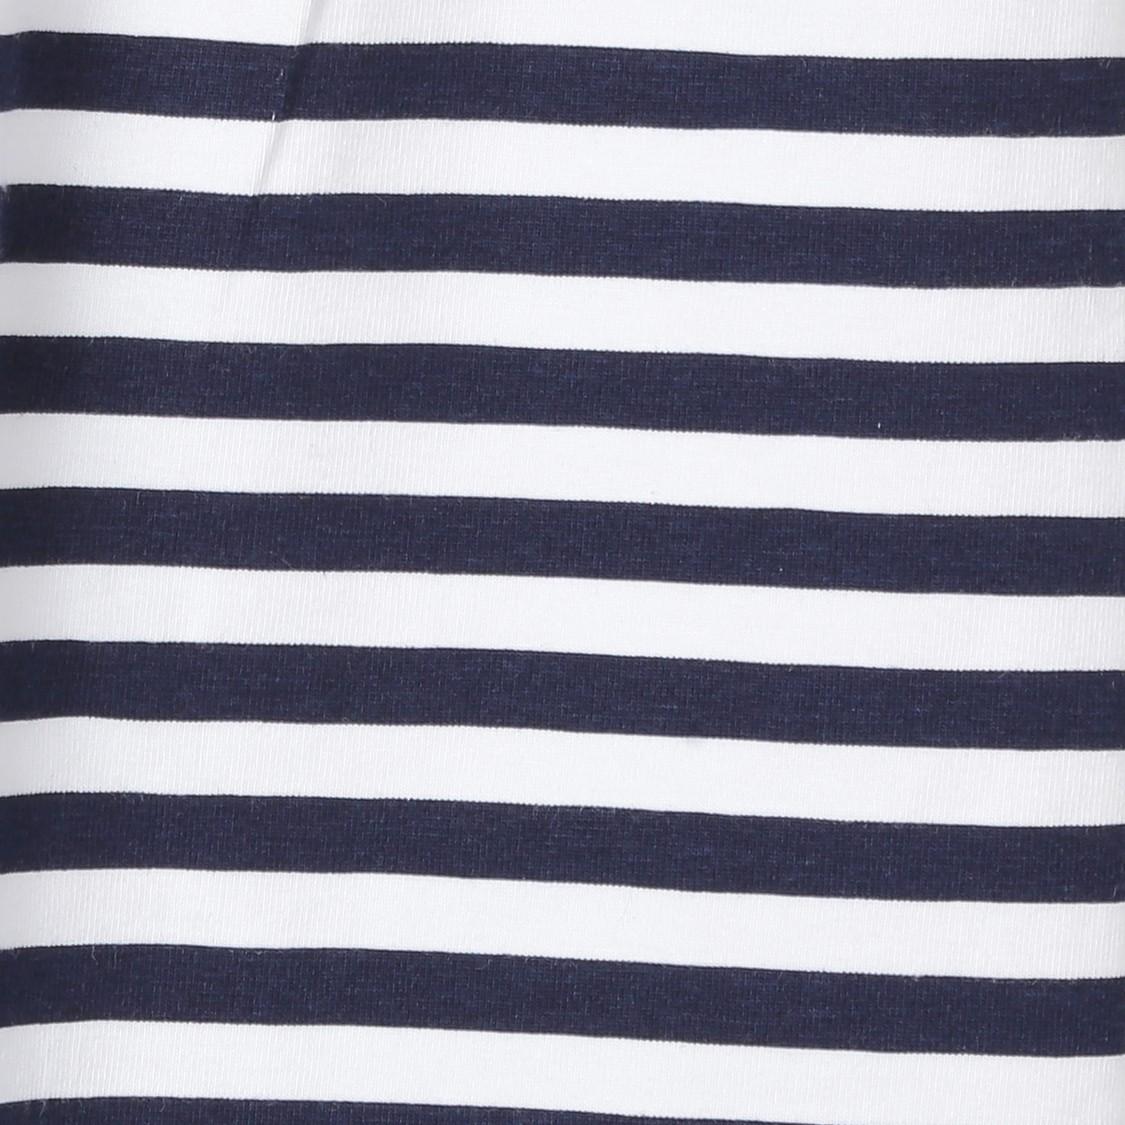 MAX Printed Full Sleeves T-shirt with Leggings